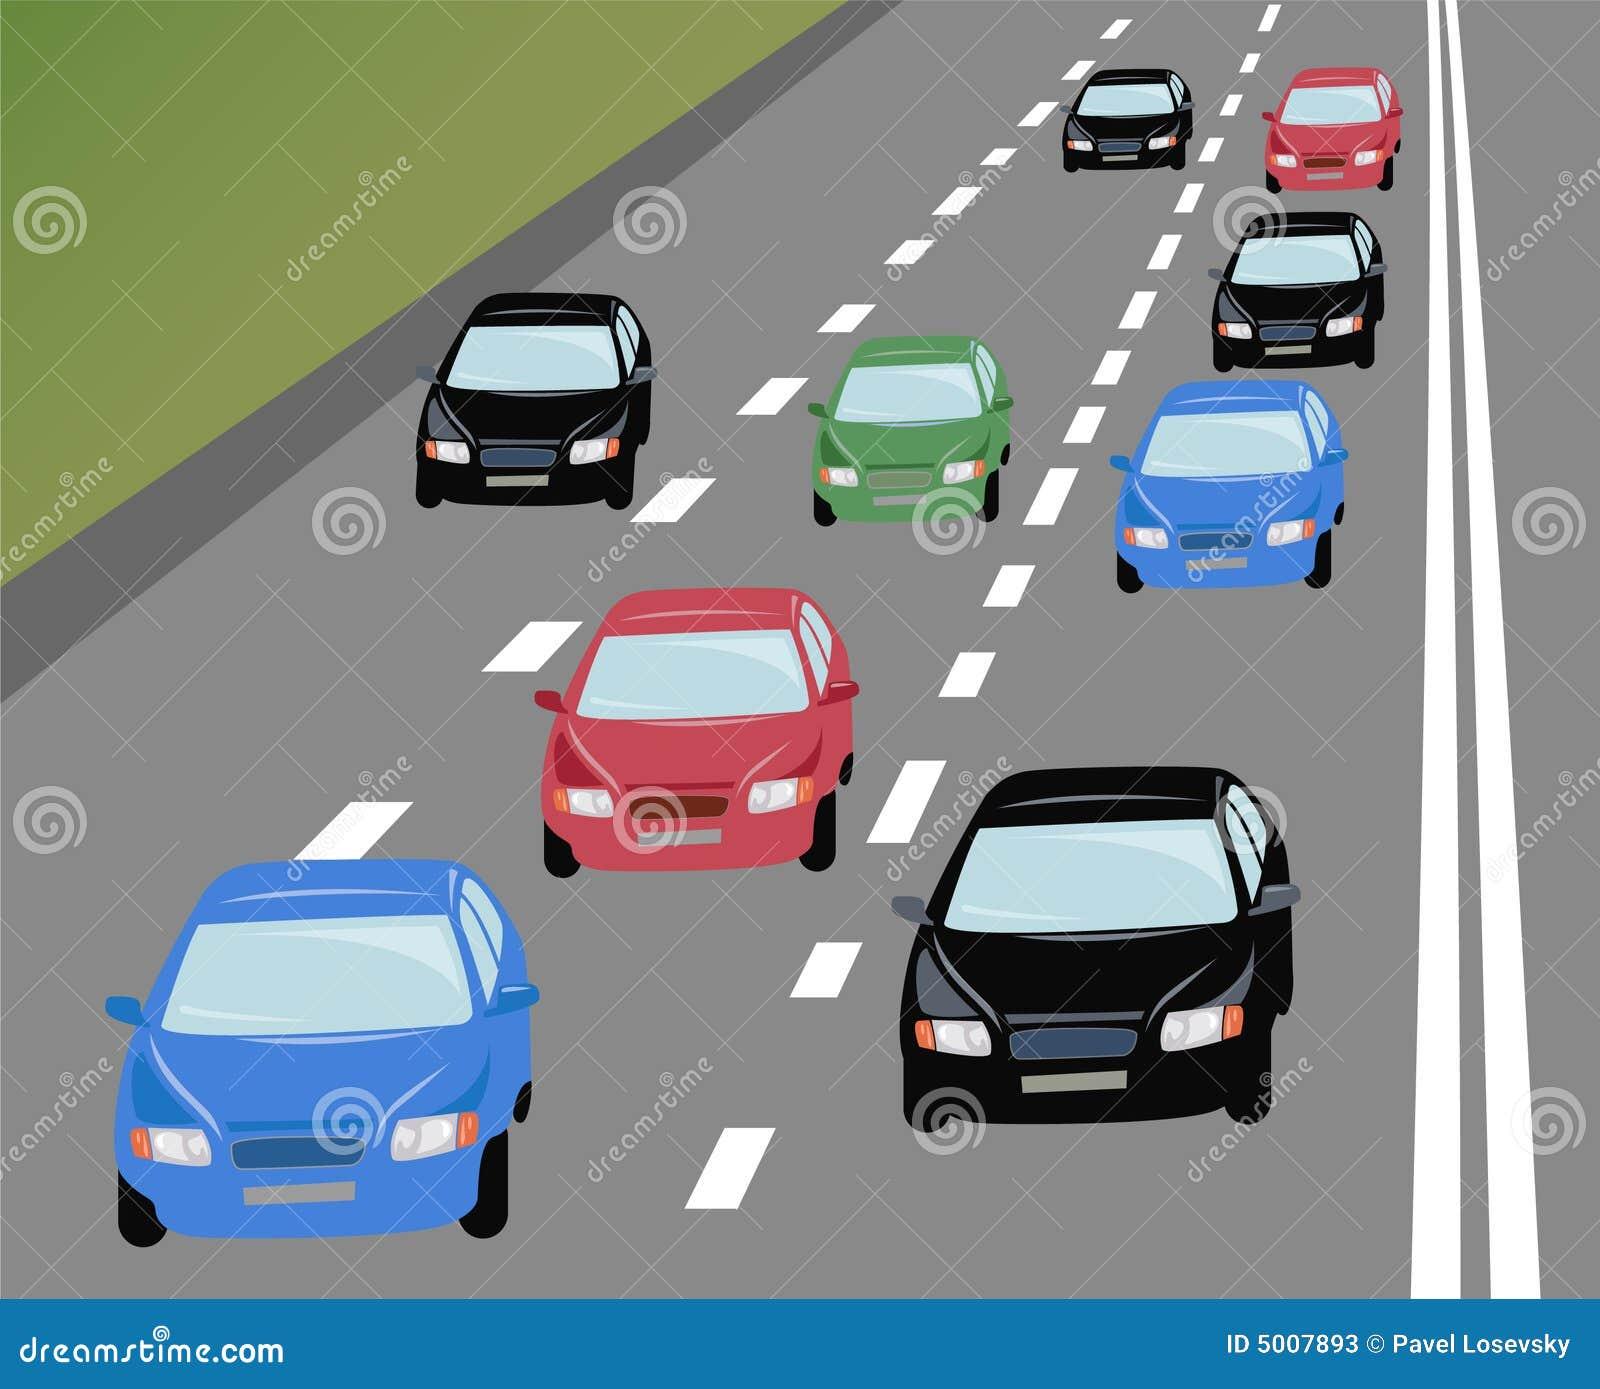 Vector Many Cars On Road Stock Vector Illustration Of Heavy 5007893